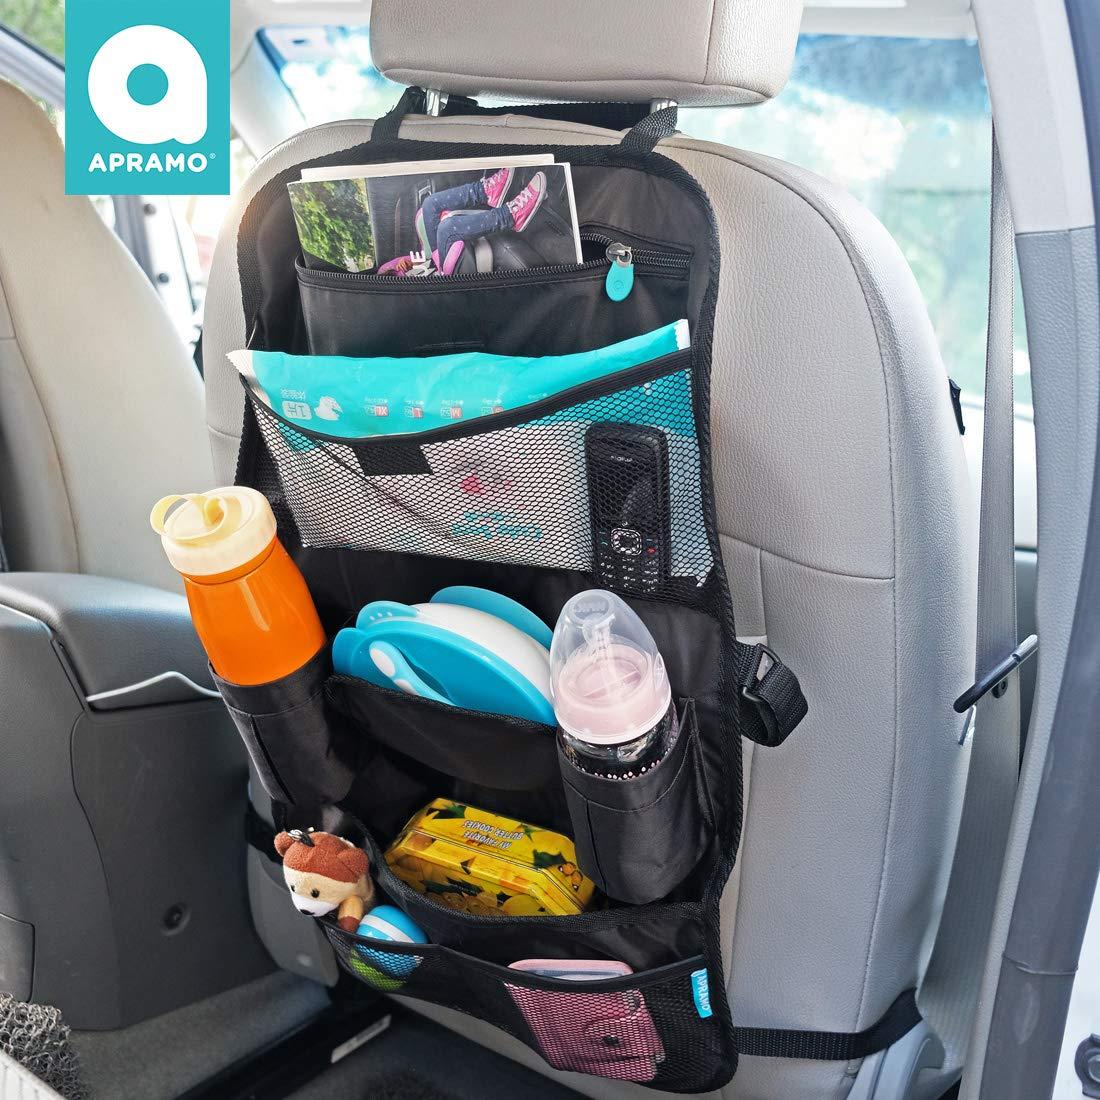 APRAMO Car Backseat Organizer with Multi Pockets Kids Toy Storage Back Seat Protector Kick Mat for Road Trips, Car Backseat Organizer for Baby Travel